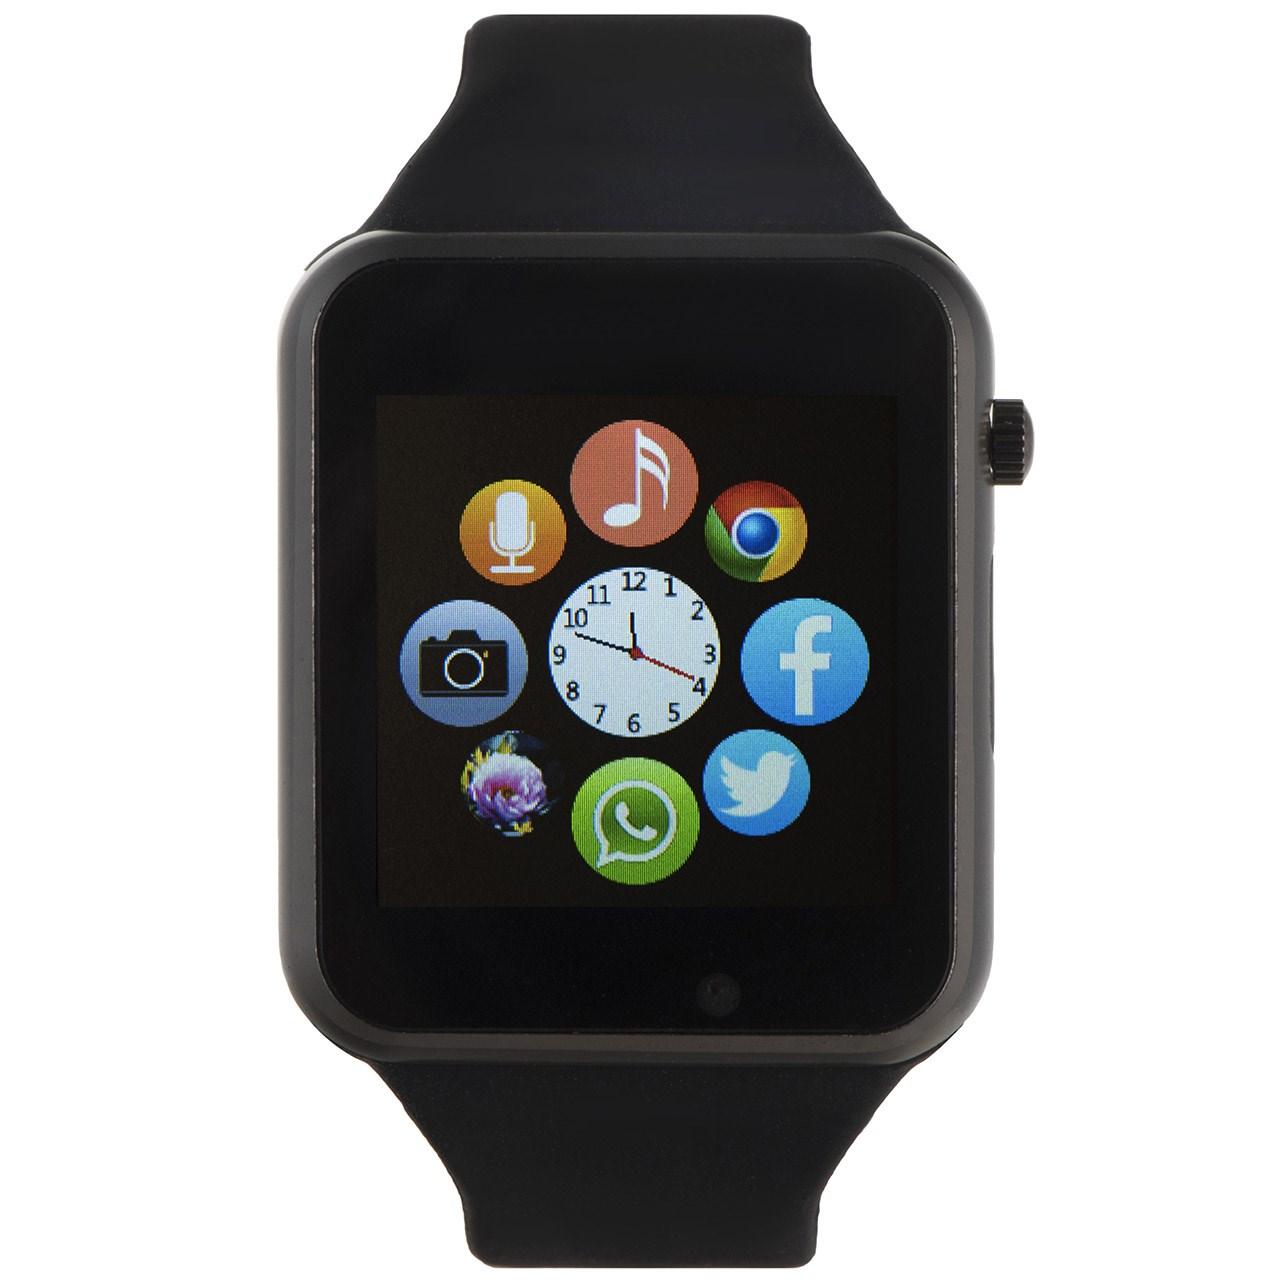 خرید ساعت هوشمند بینگولا مدل A1